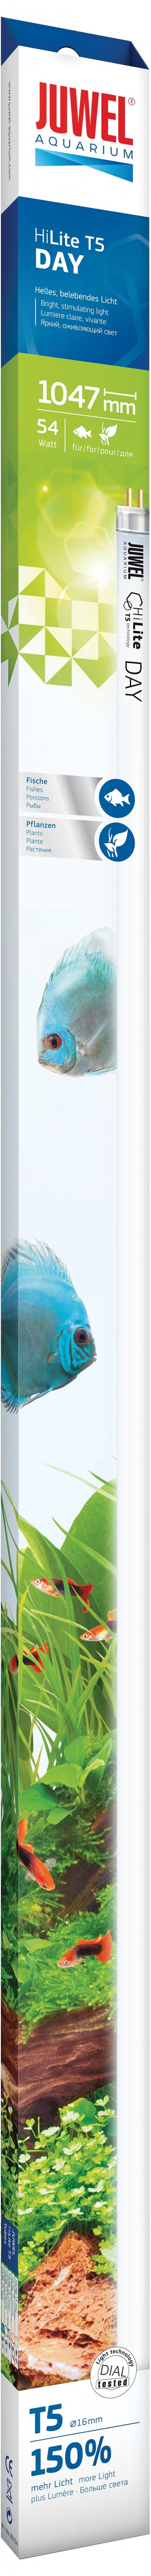 Лампа для аквариума - High-Lite Day T5 54W 1047mm